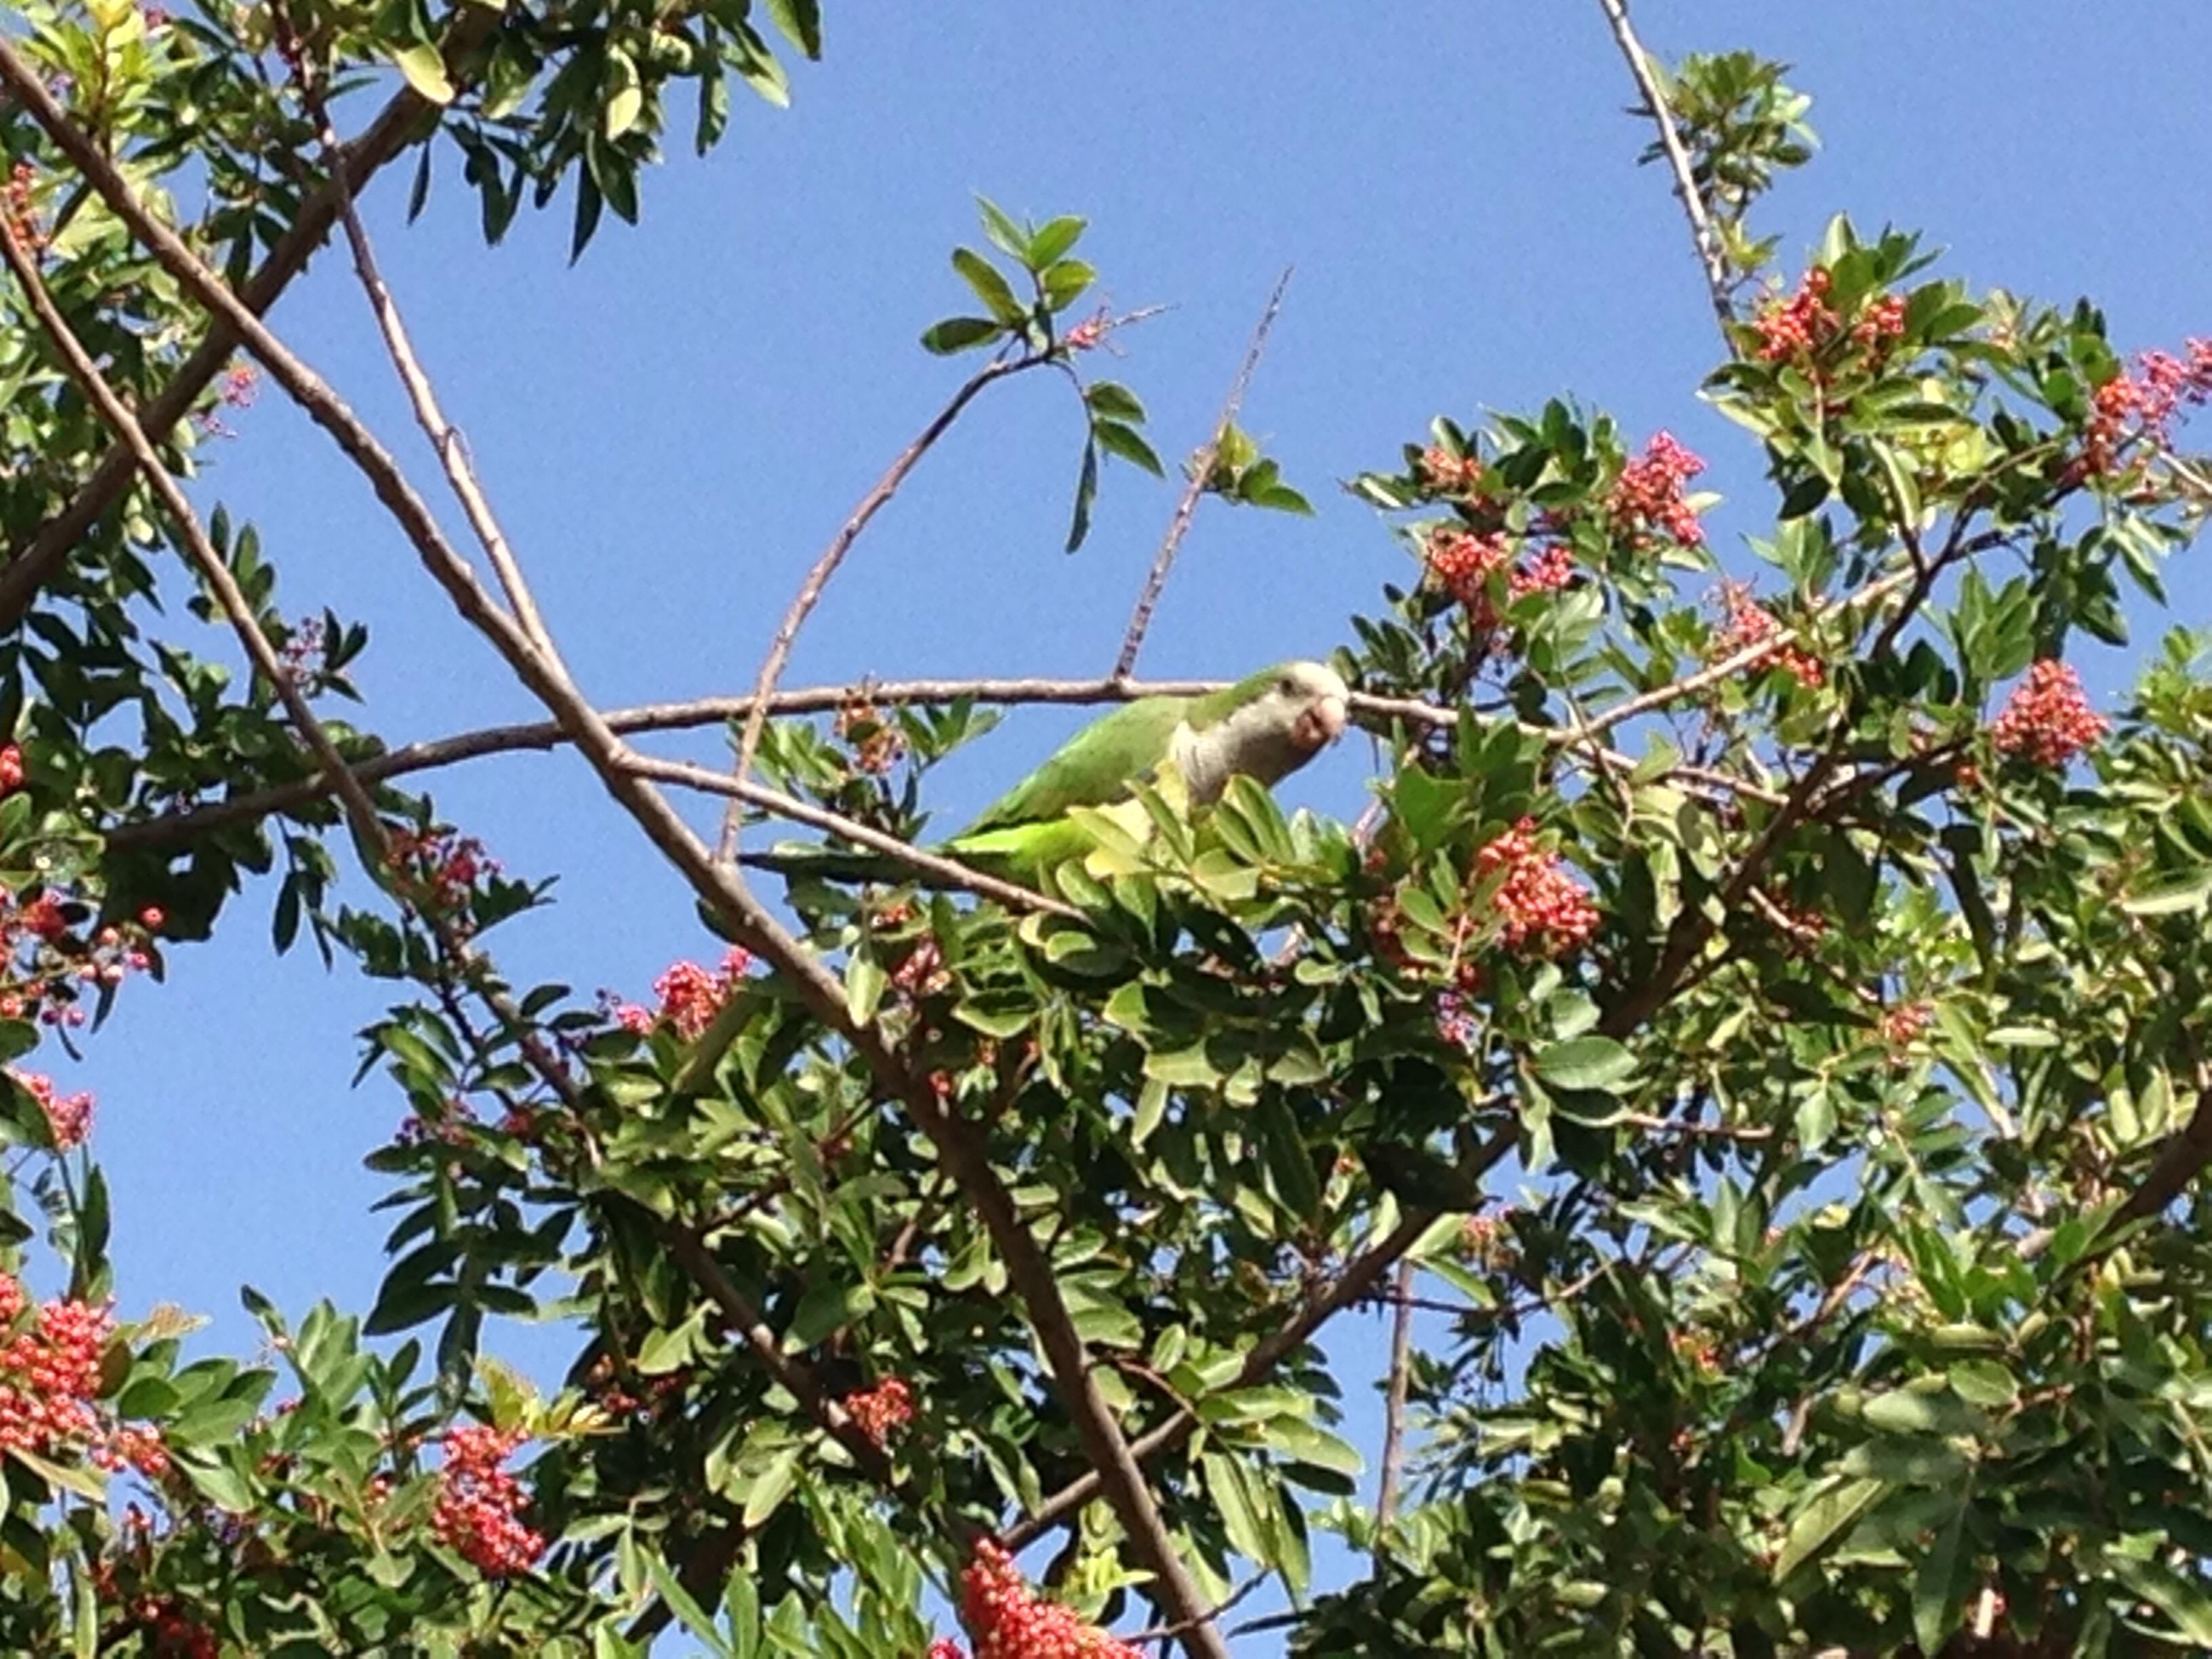 Green parrot by jomy10